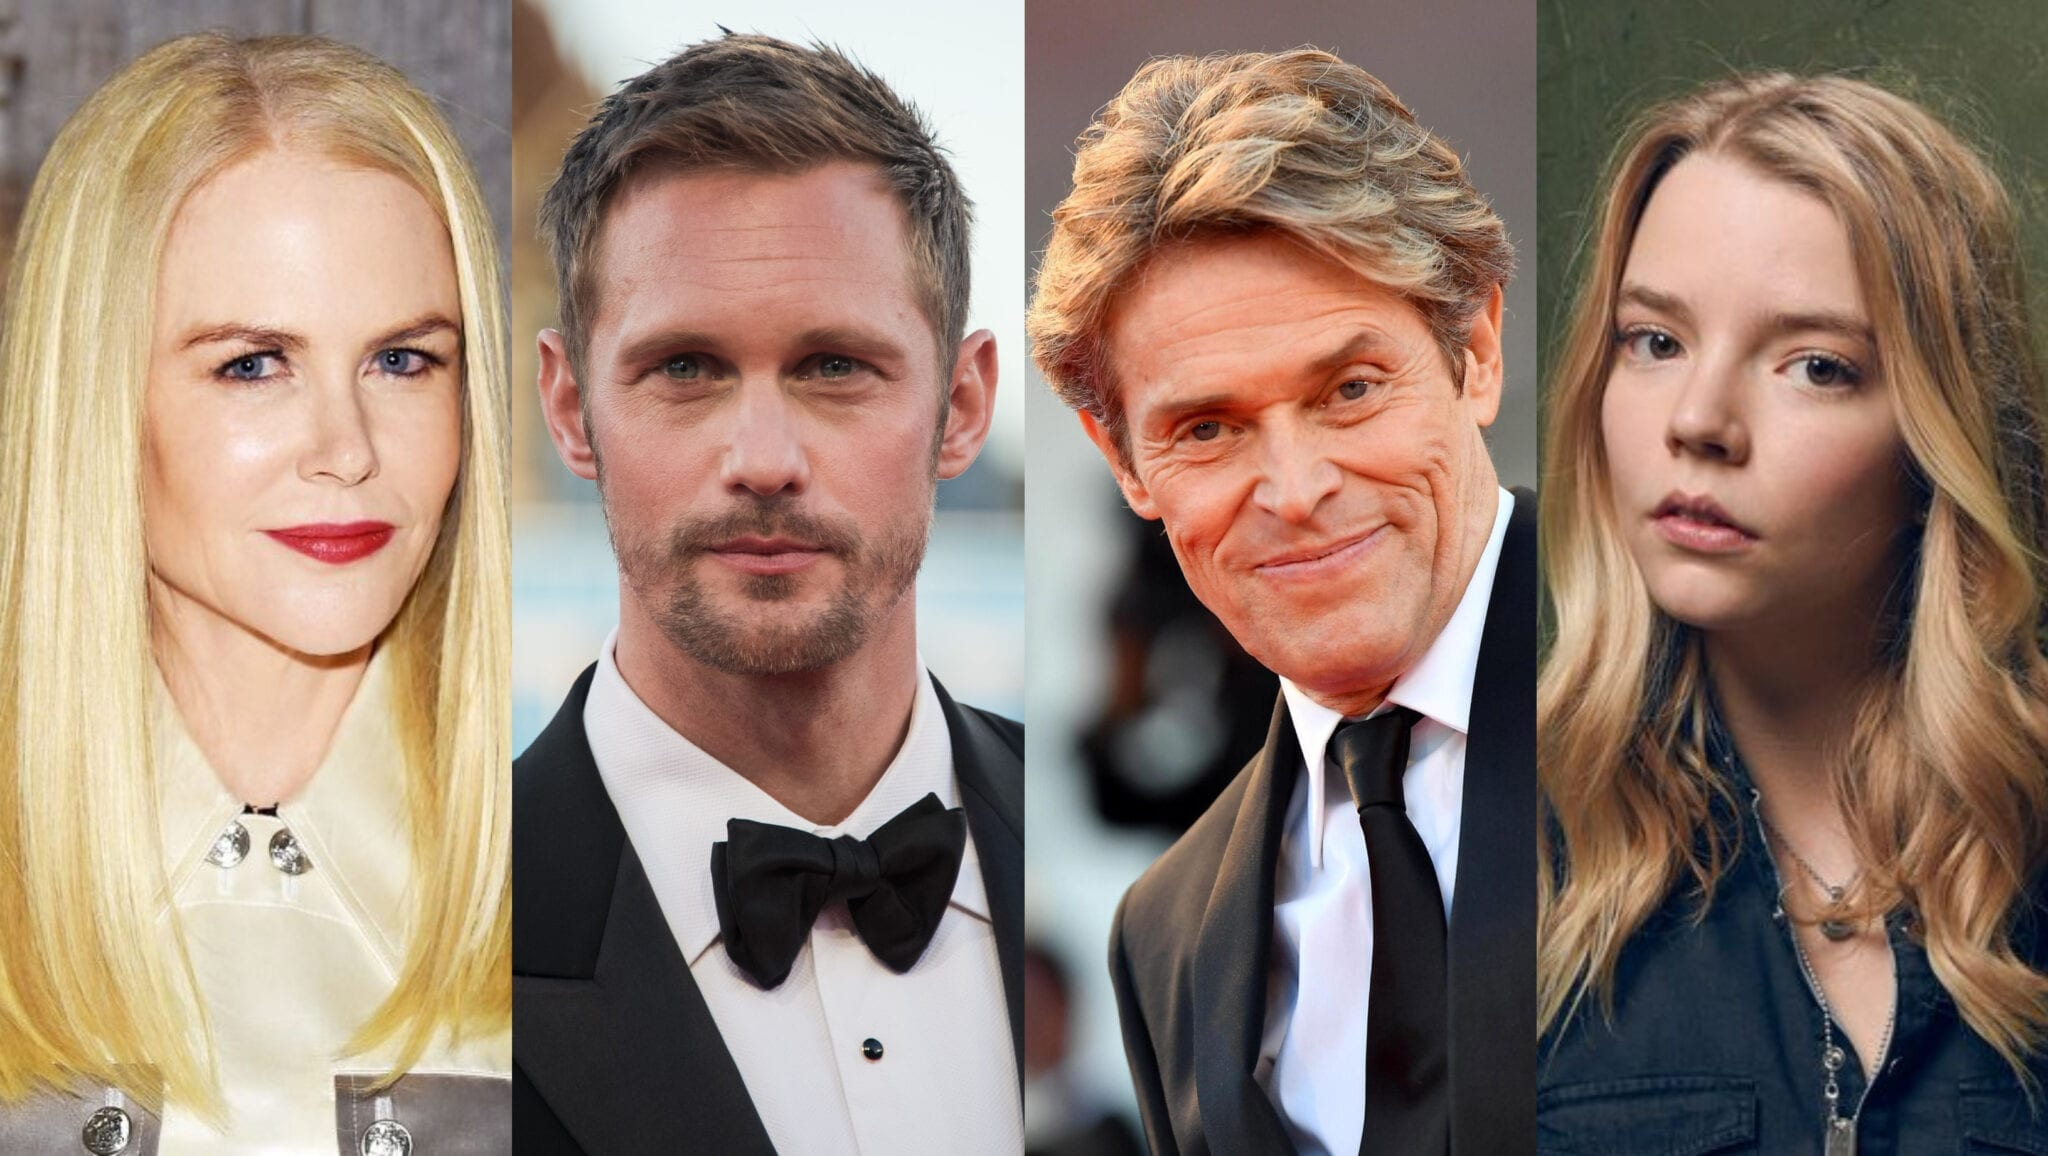 Film News: Casting Announced for Robert Eggers' Viking Saga 'The Northman'